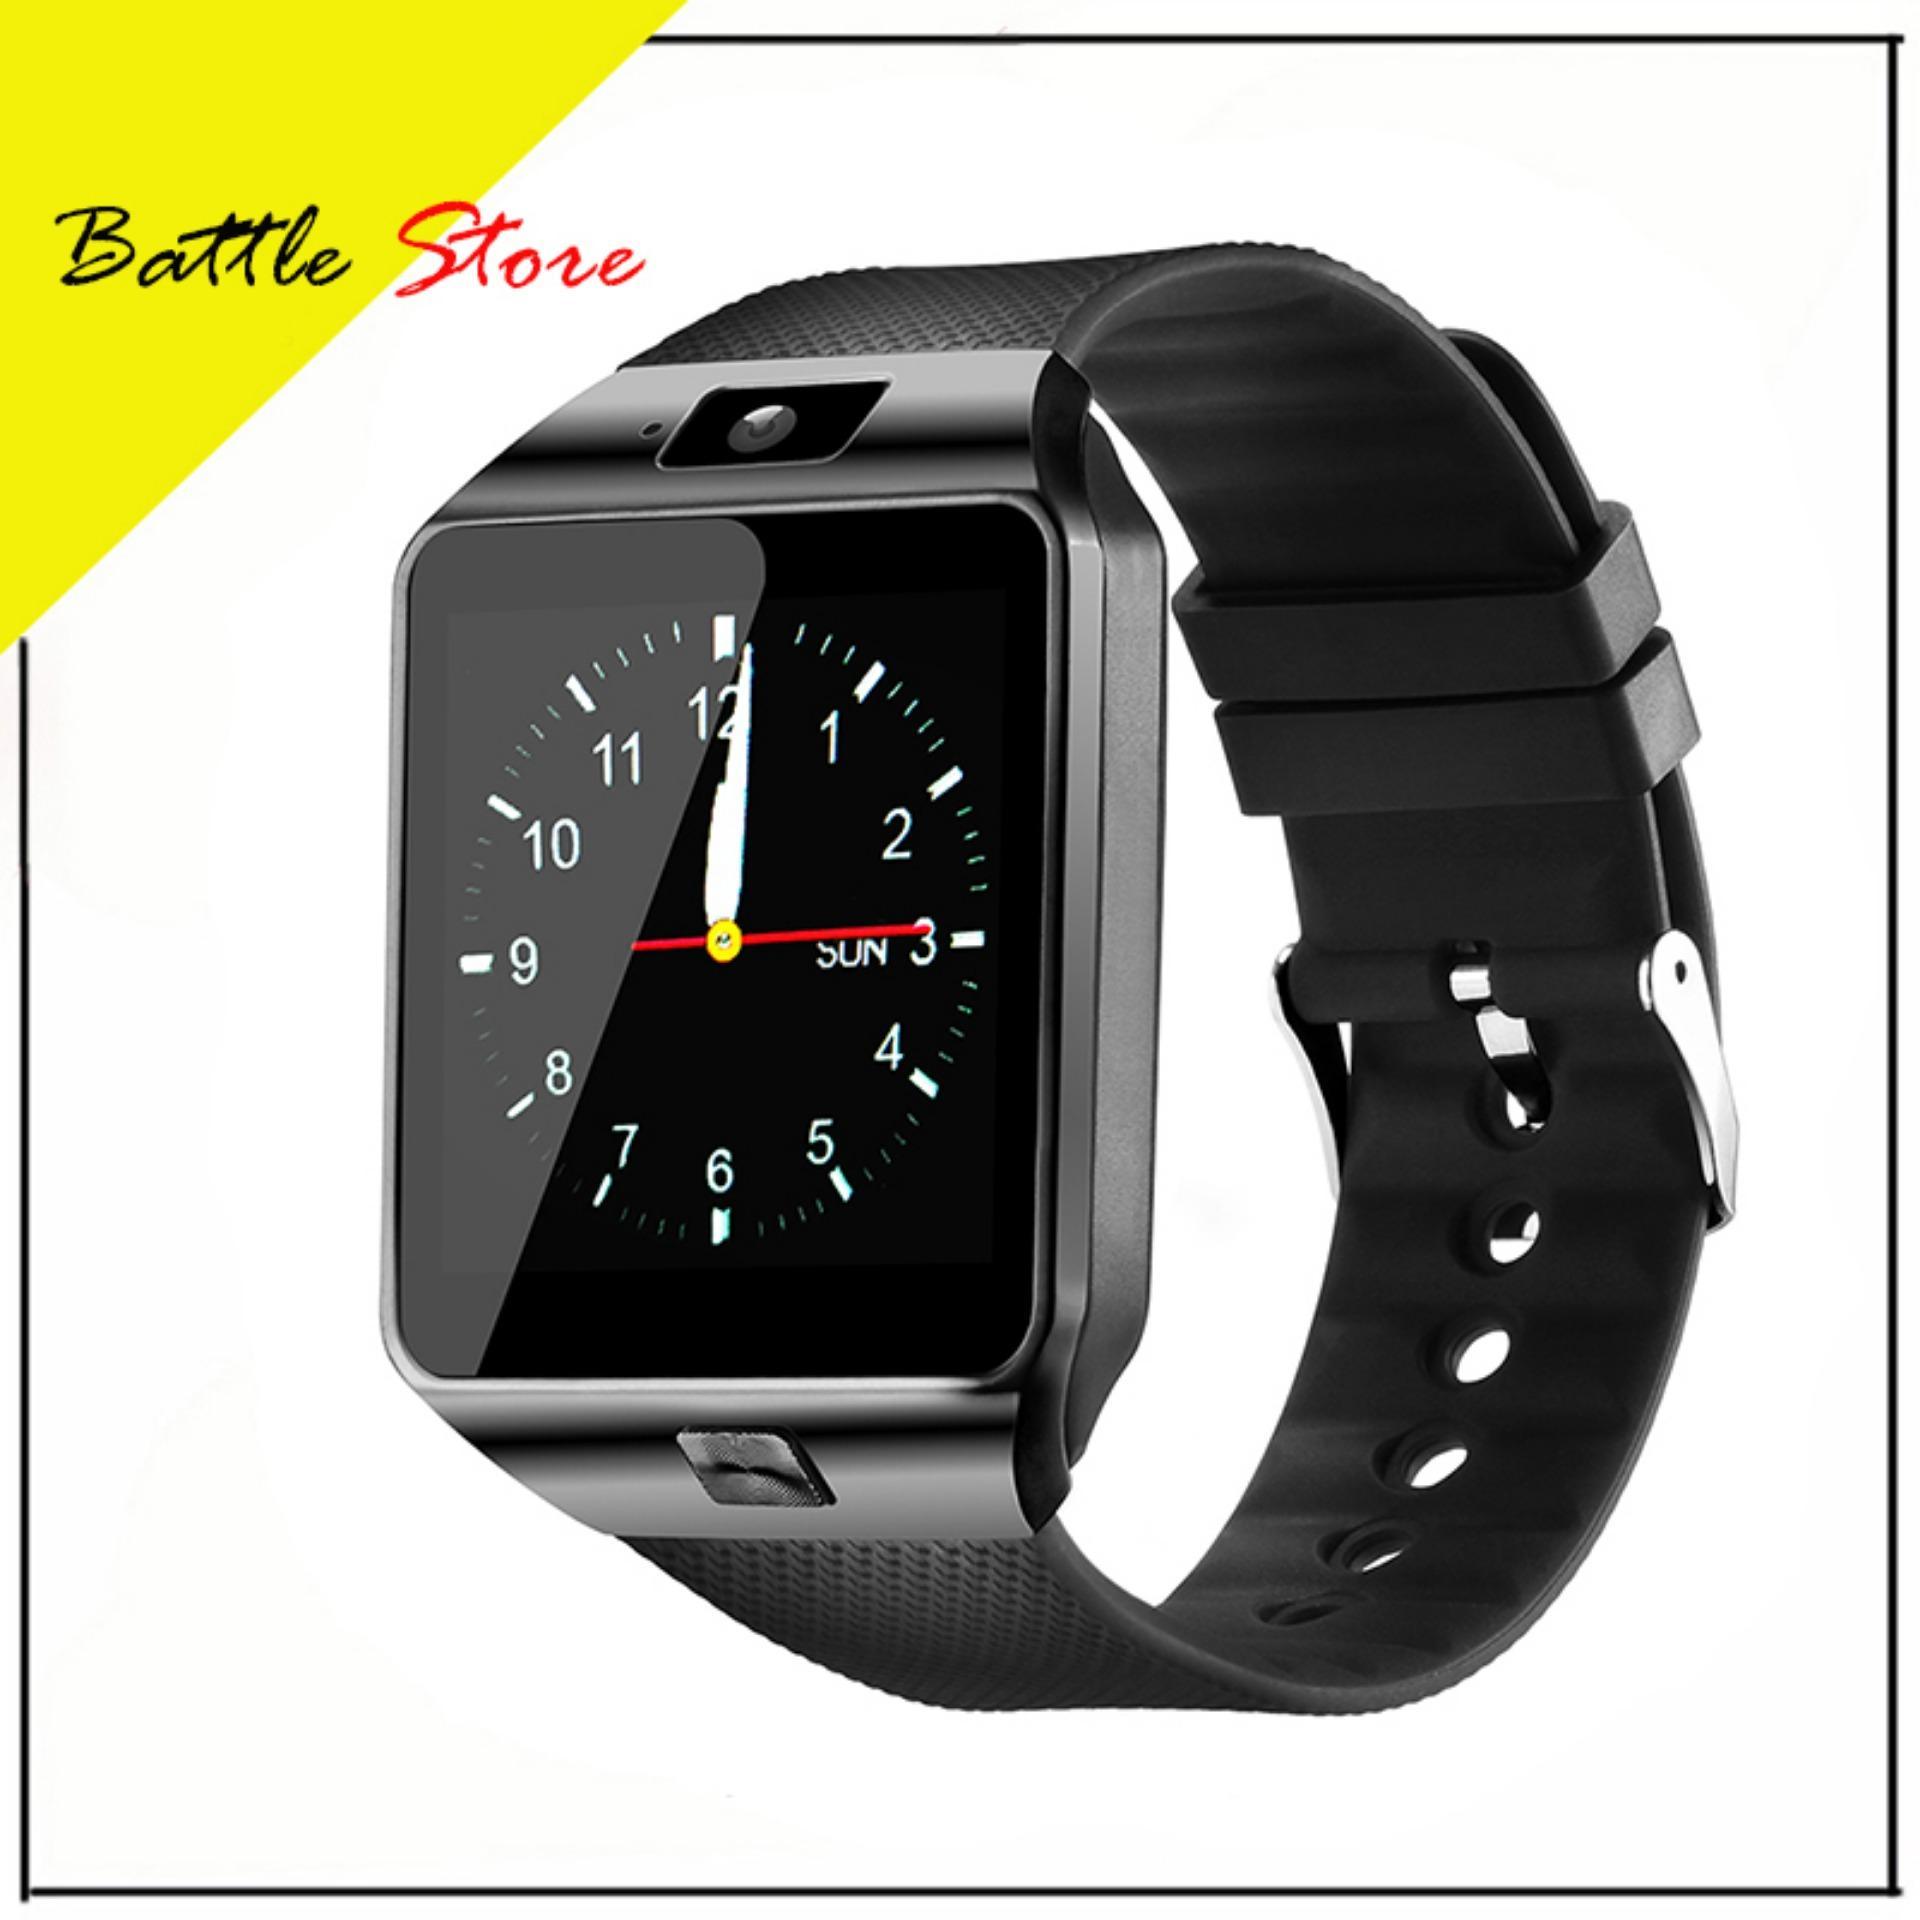 Smartwatch U9 / DZ09 / Smart Watch DZ09 Support Sim Card & Memory Card / Jam